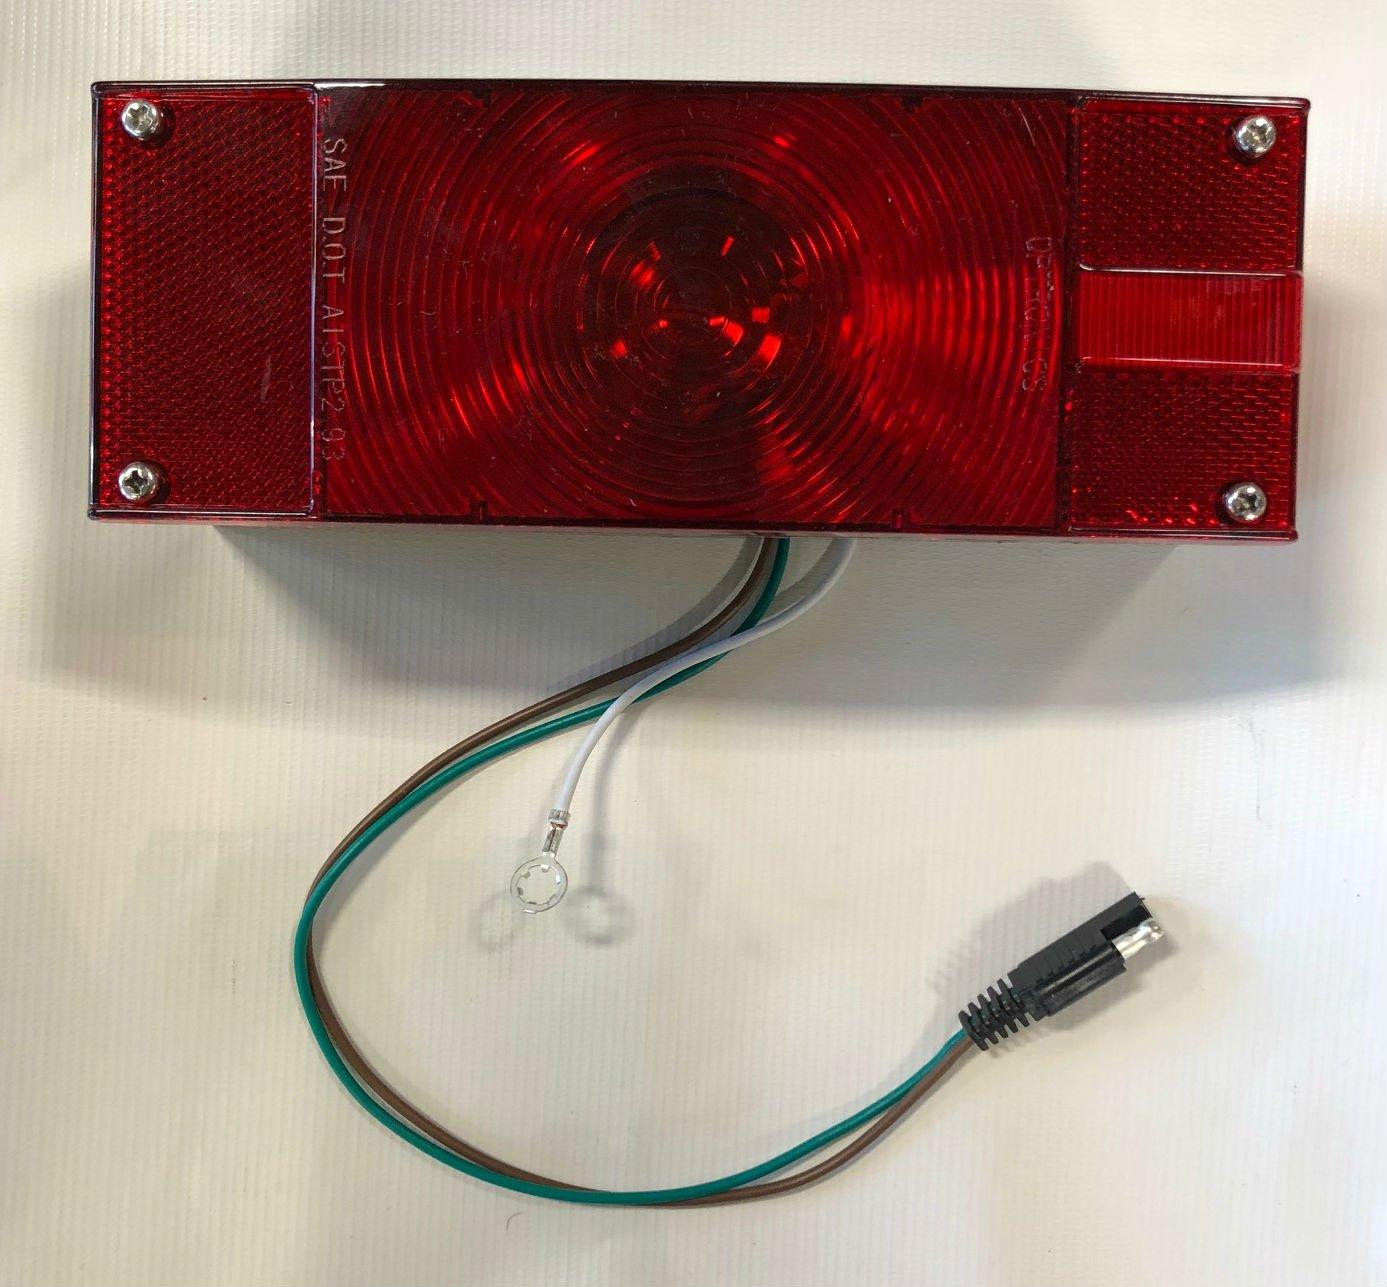 Triton 06304 Enclosed Rectangle Right Tail Light